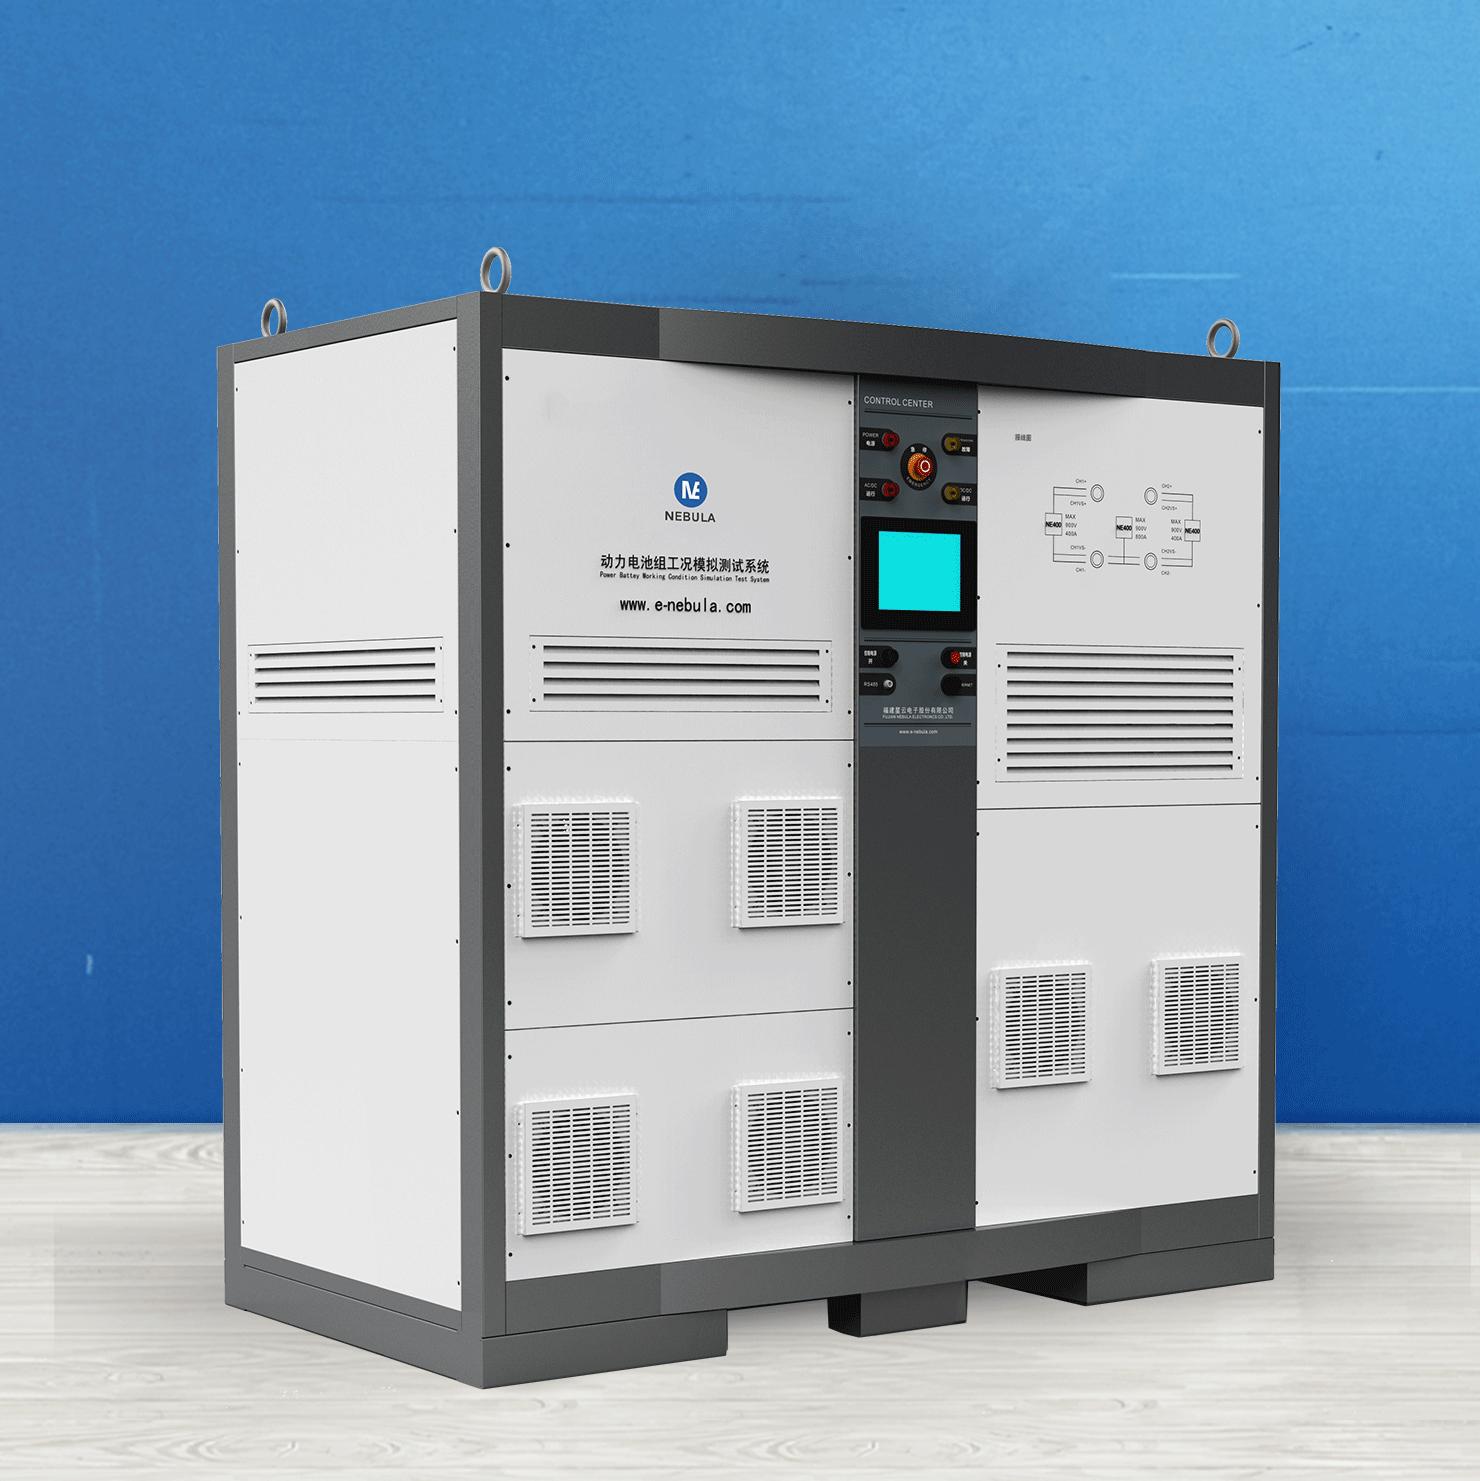 充放电测试系统900V系列 Featured Image